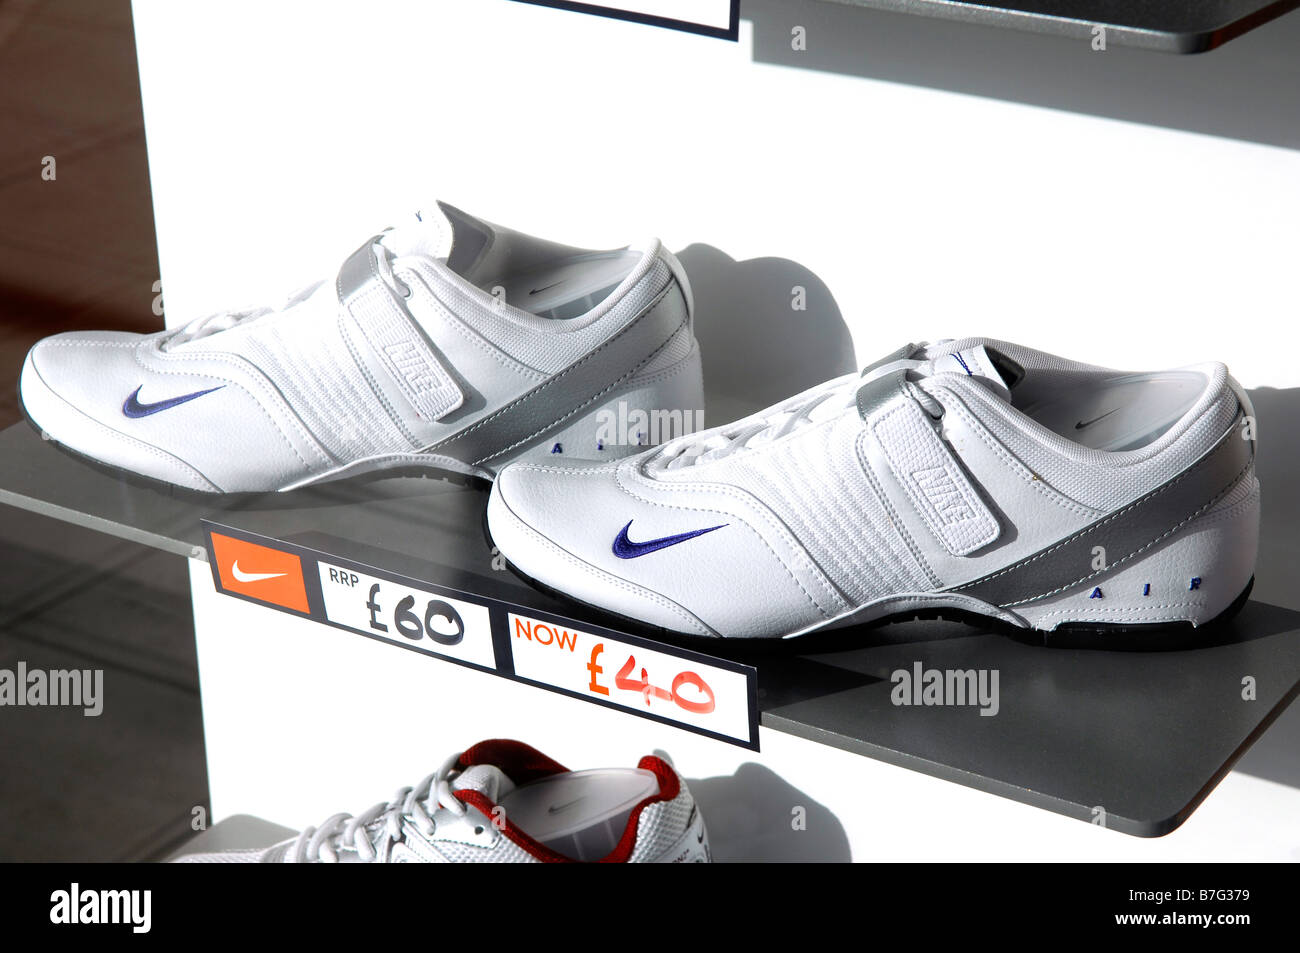 Américaine Chaussure Chaussure Nike Nike Chaussure Américaine Américaine Chaussure Nike nP80wOXk